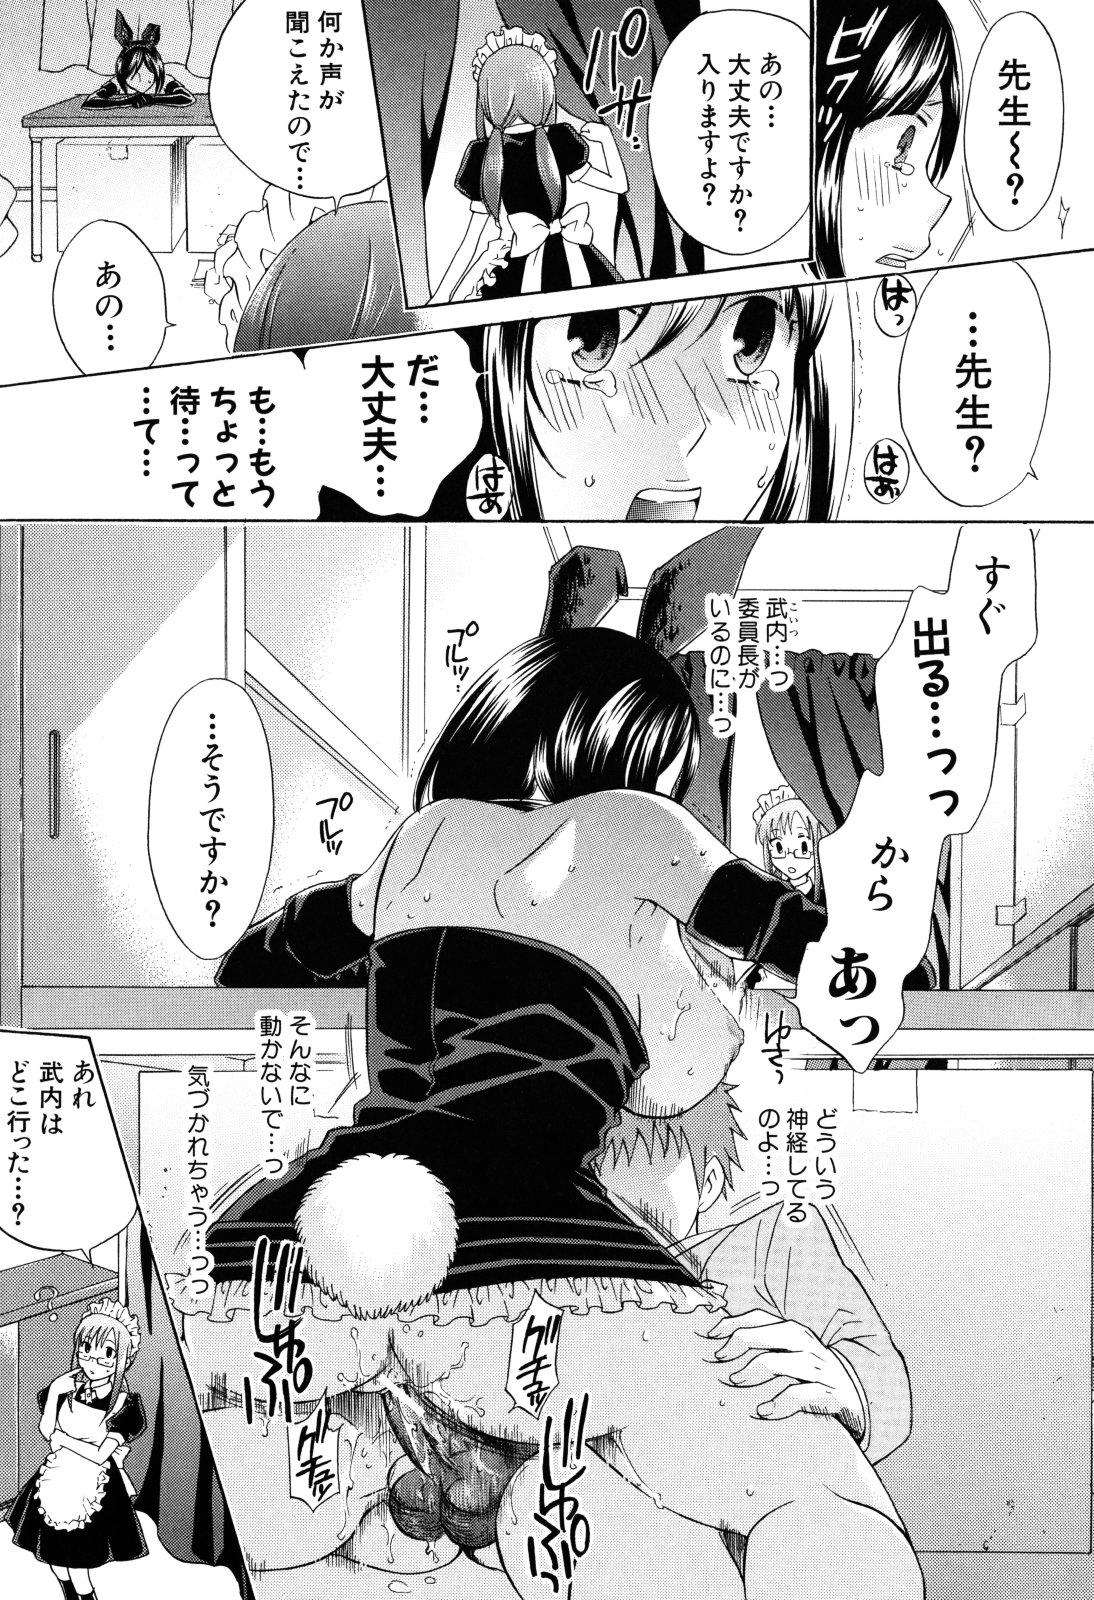 Kanojo ga Ochiru made - She in the depth 138